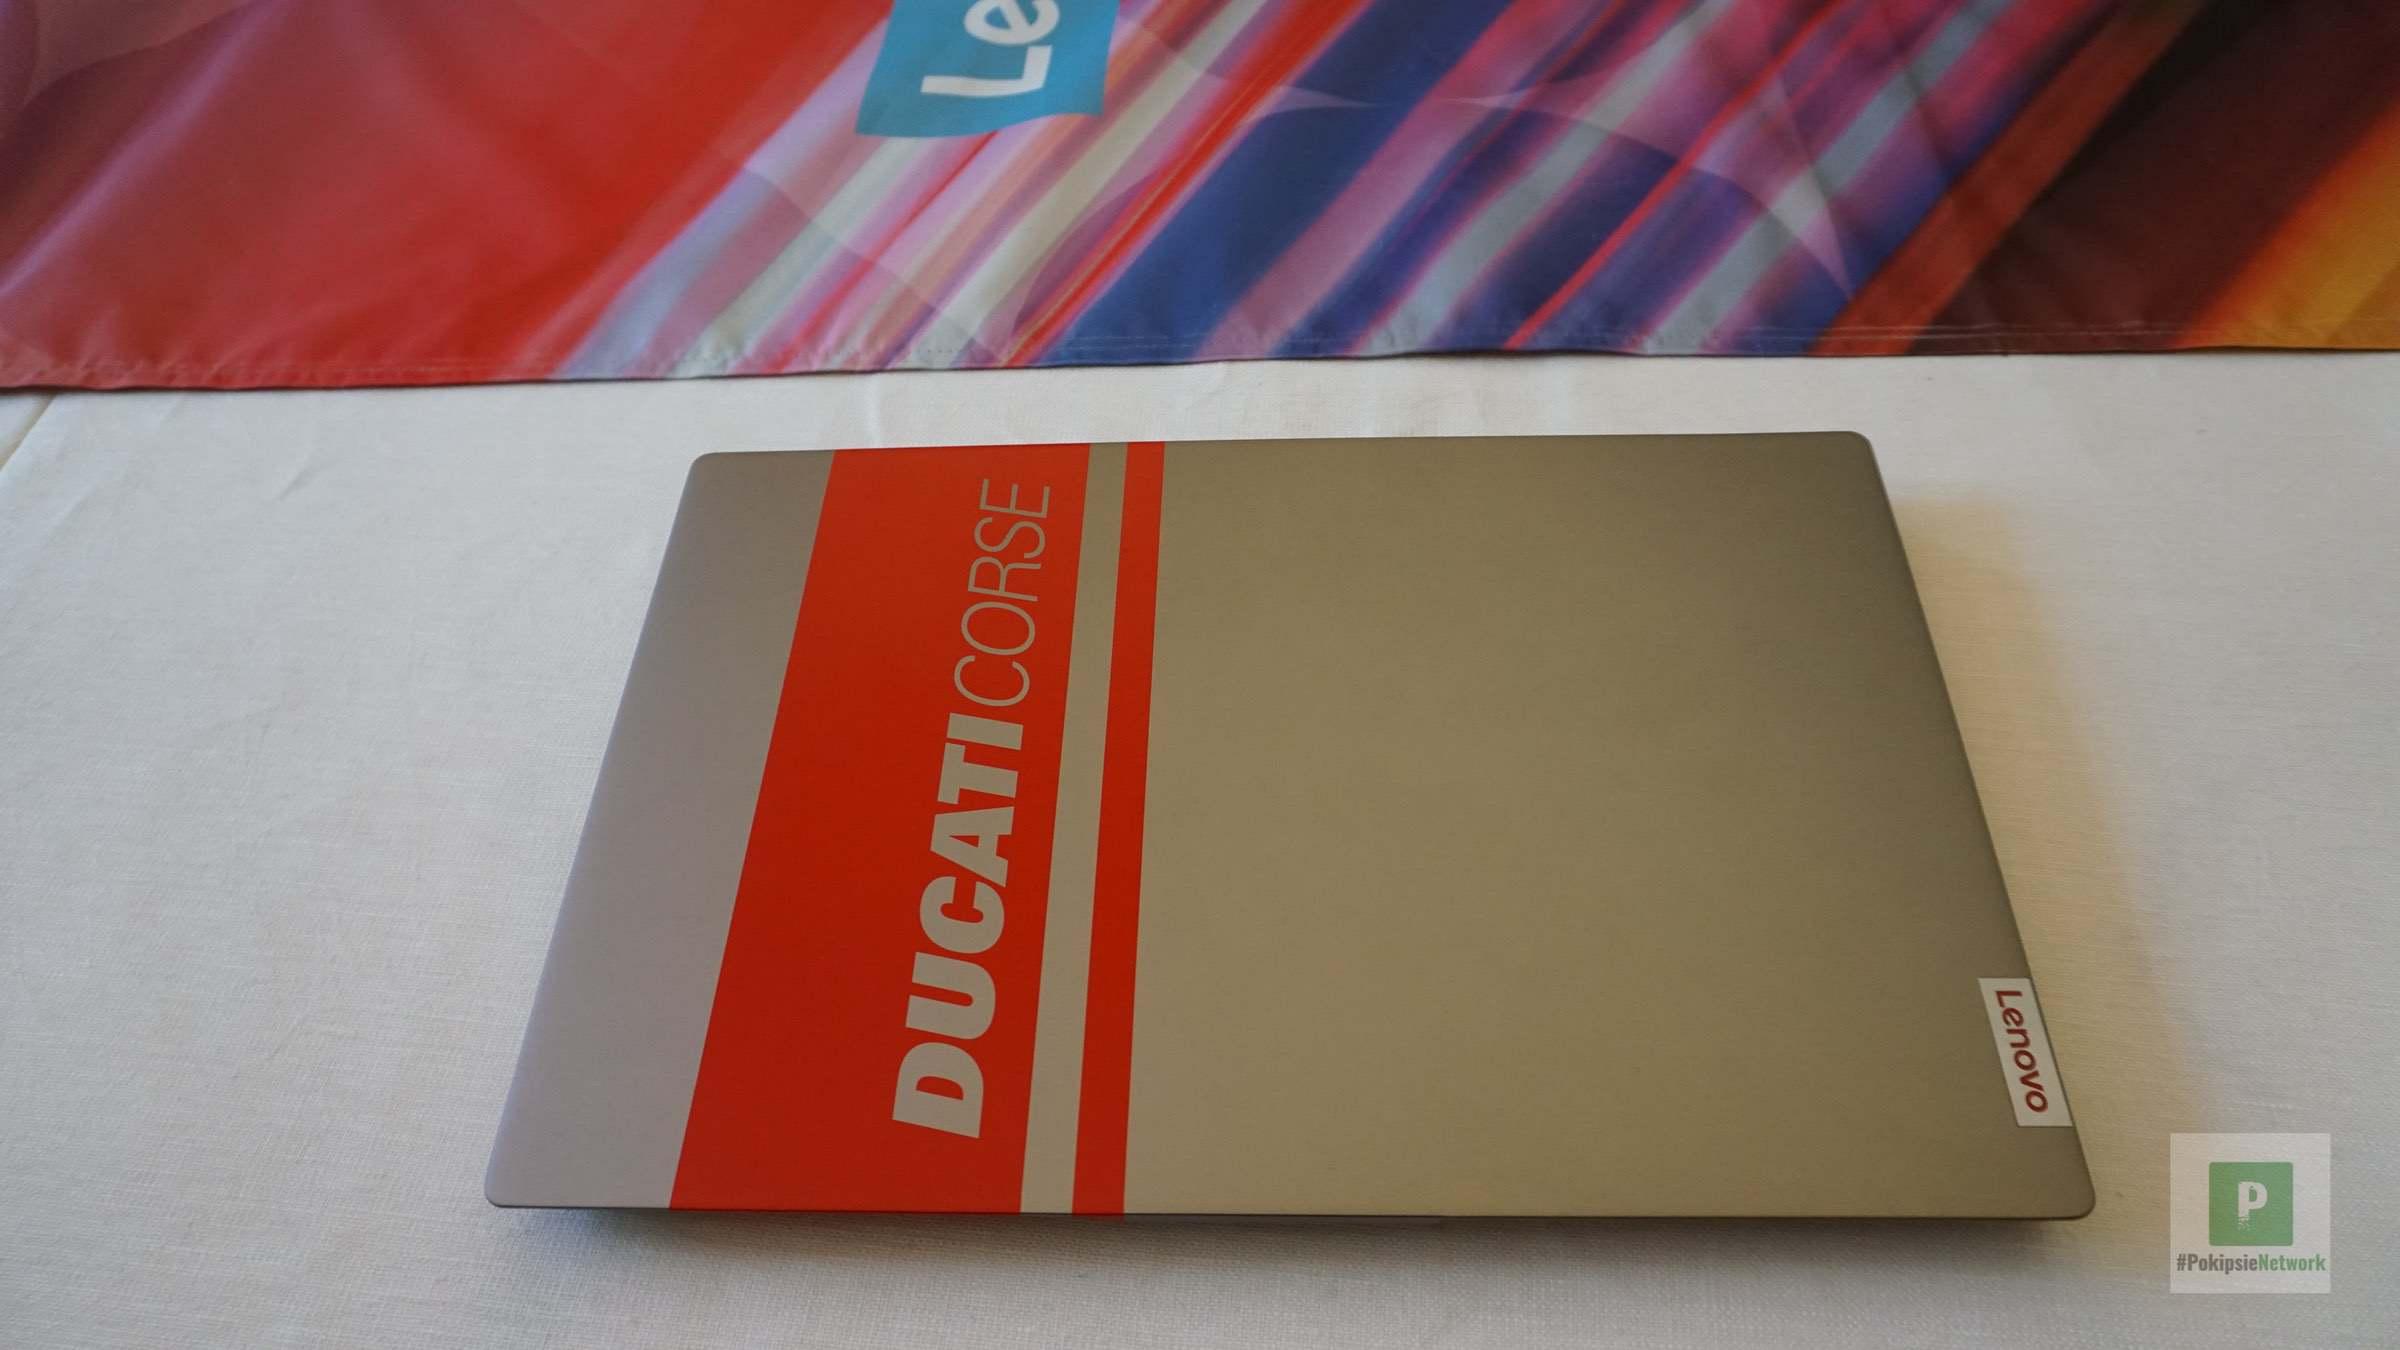 Die Ducati und Lenovo Kooperation